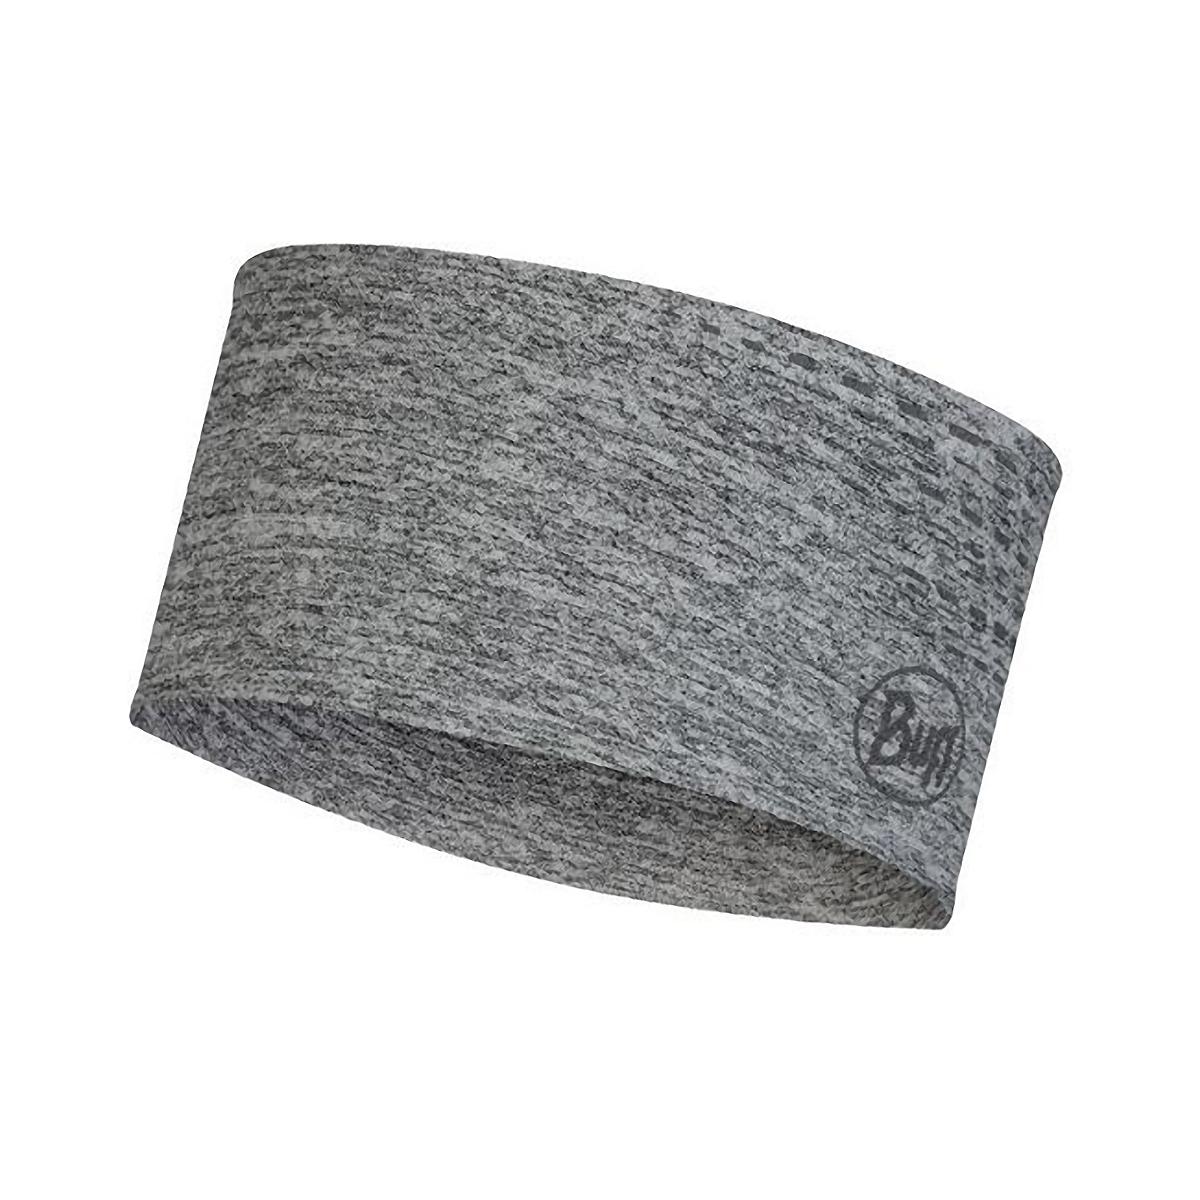 Buff Dryflx Headband, , large, image 1